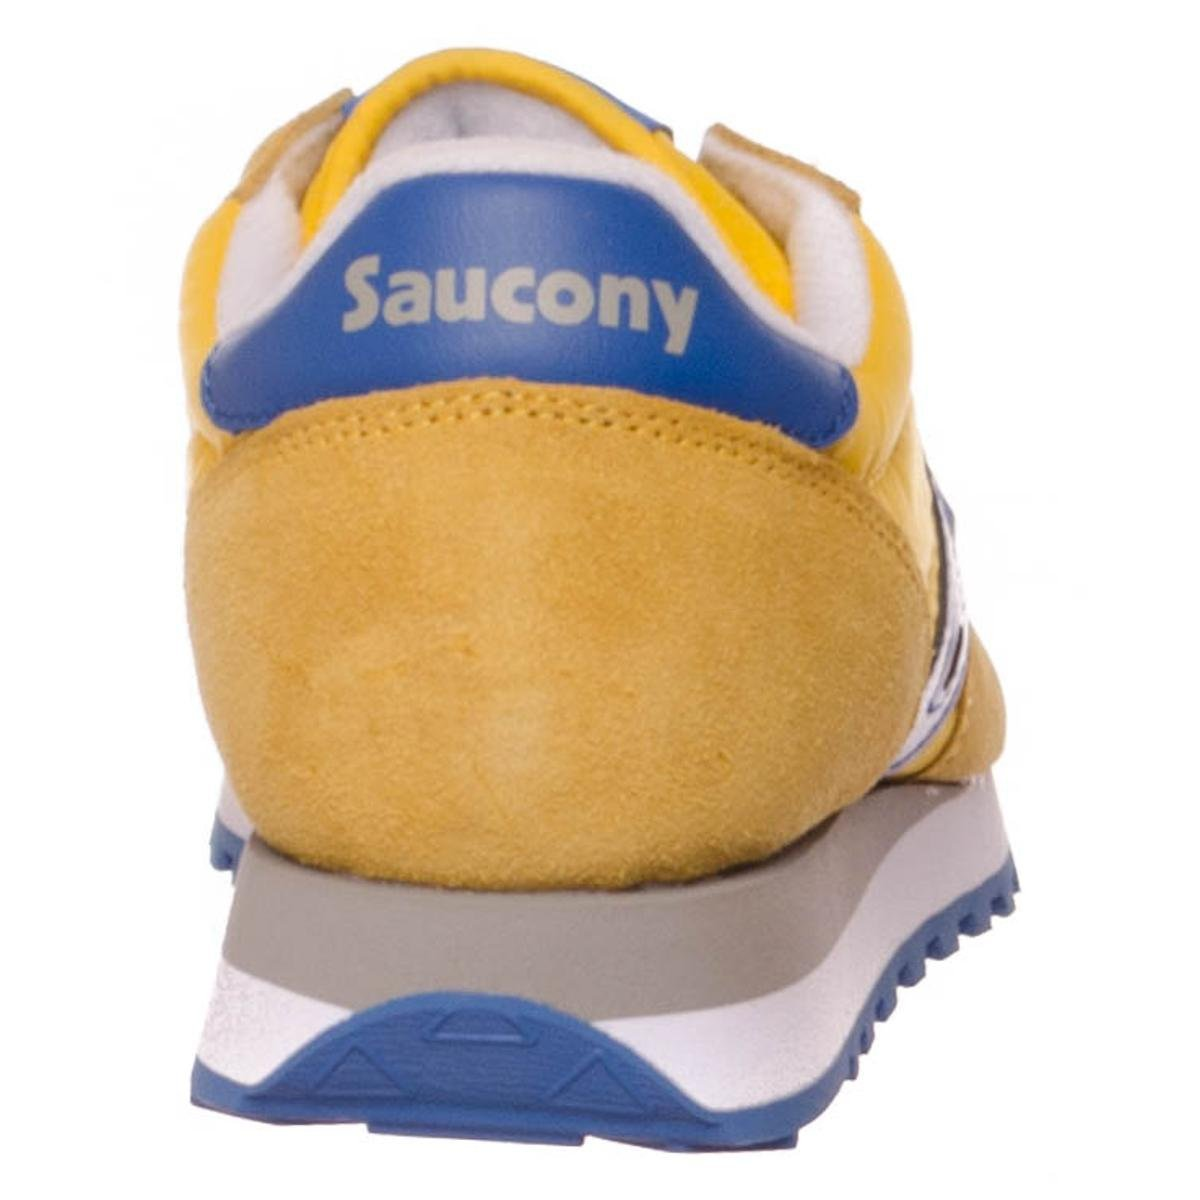 Saucony-Turnschuhe Jazz Original in Camoscio e Nylon 20442    b8d1ba